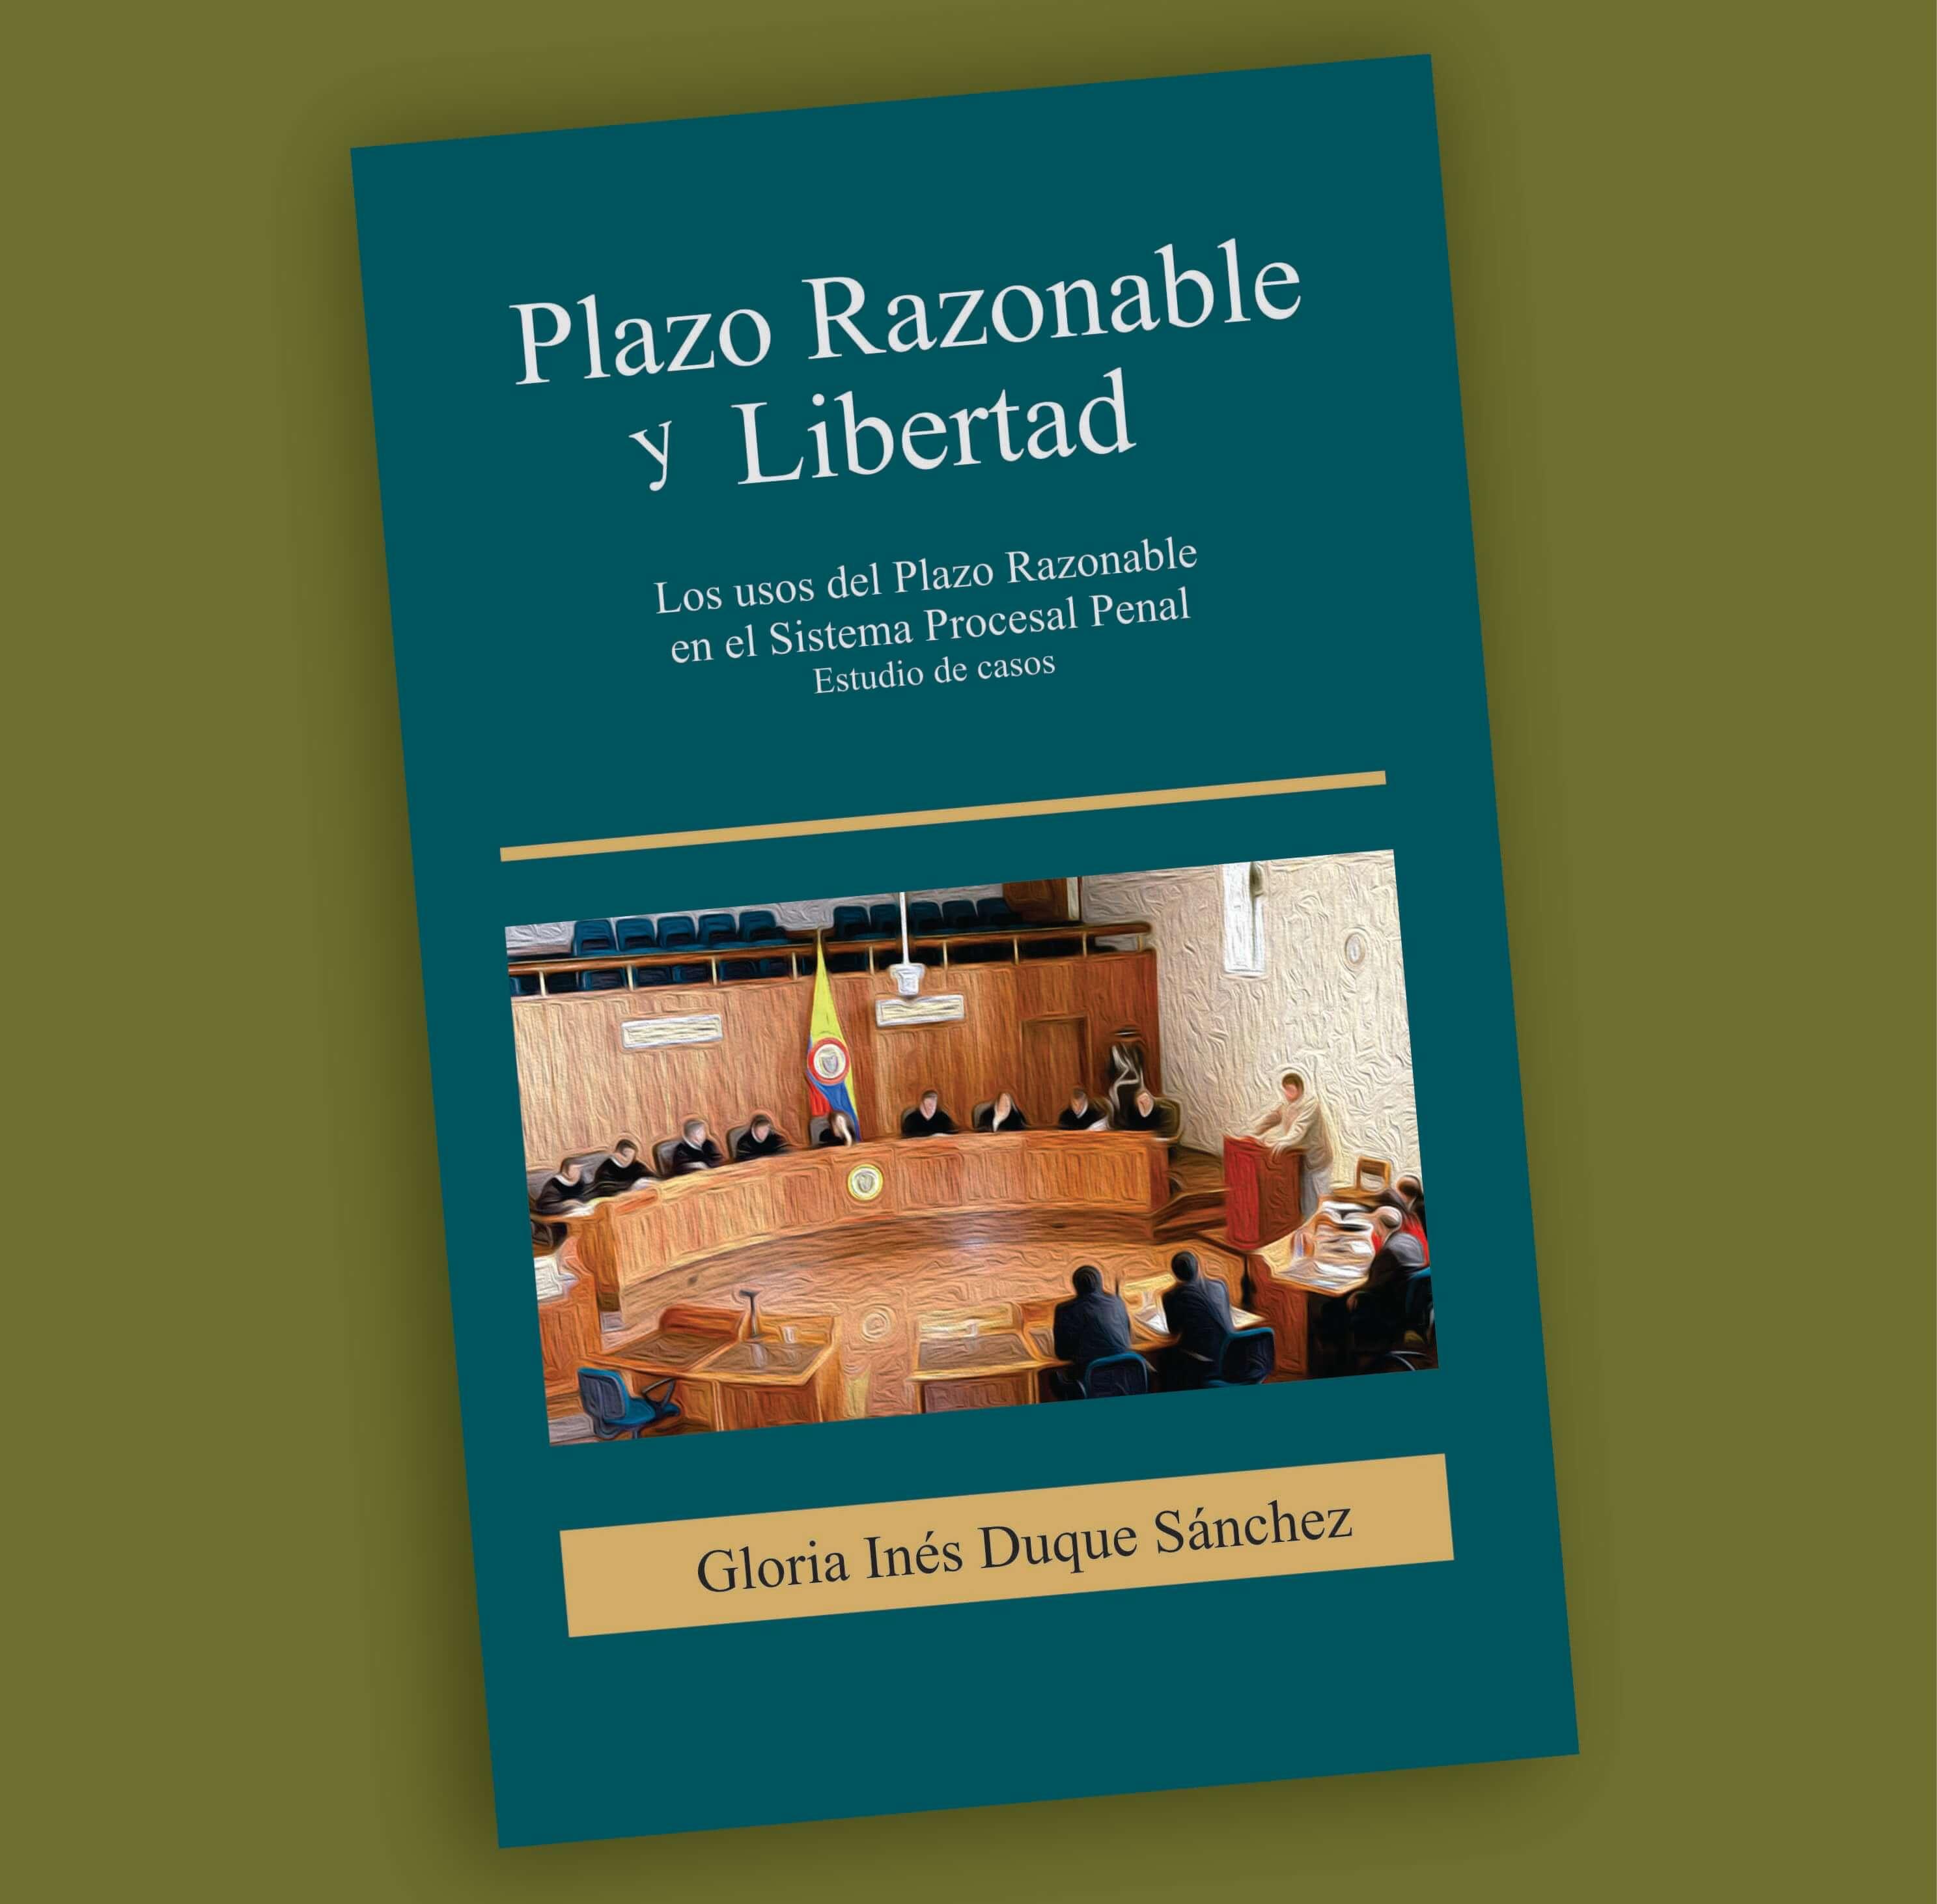 Plazo Razonable y Libertad- Gloria Inés Duque Sánchez